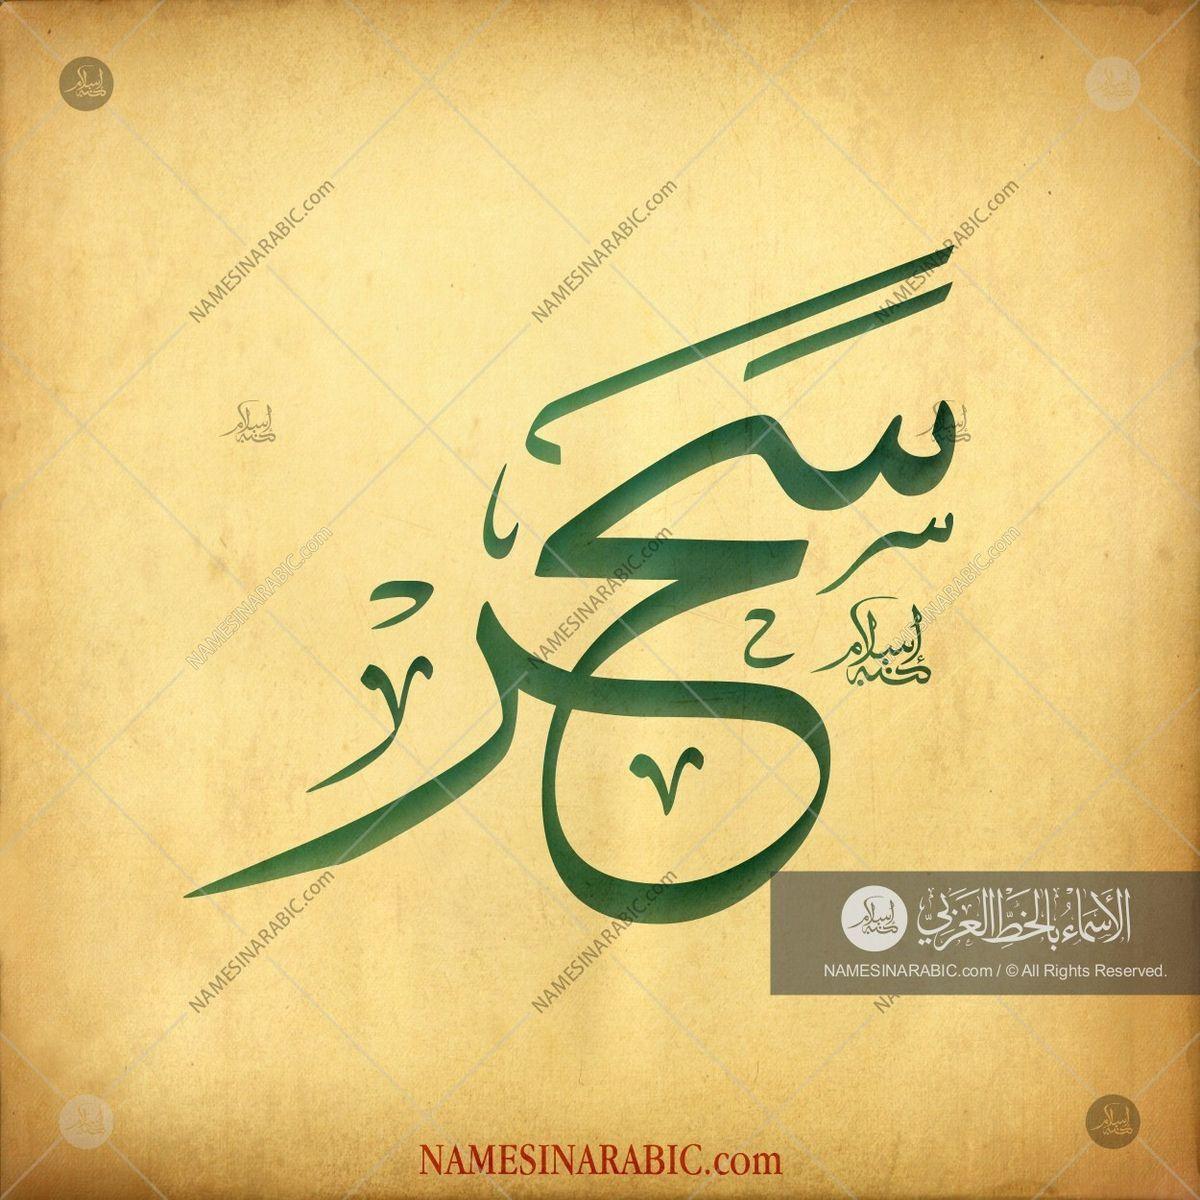 Pin By Anan Sh On Arabic Calligraphy Calligraphy Name Calligraphy Islamic Calligraphy